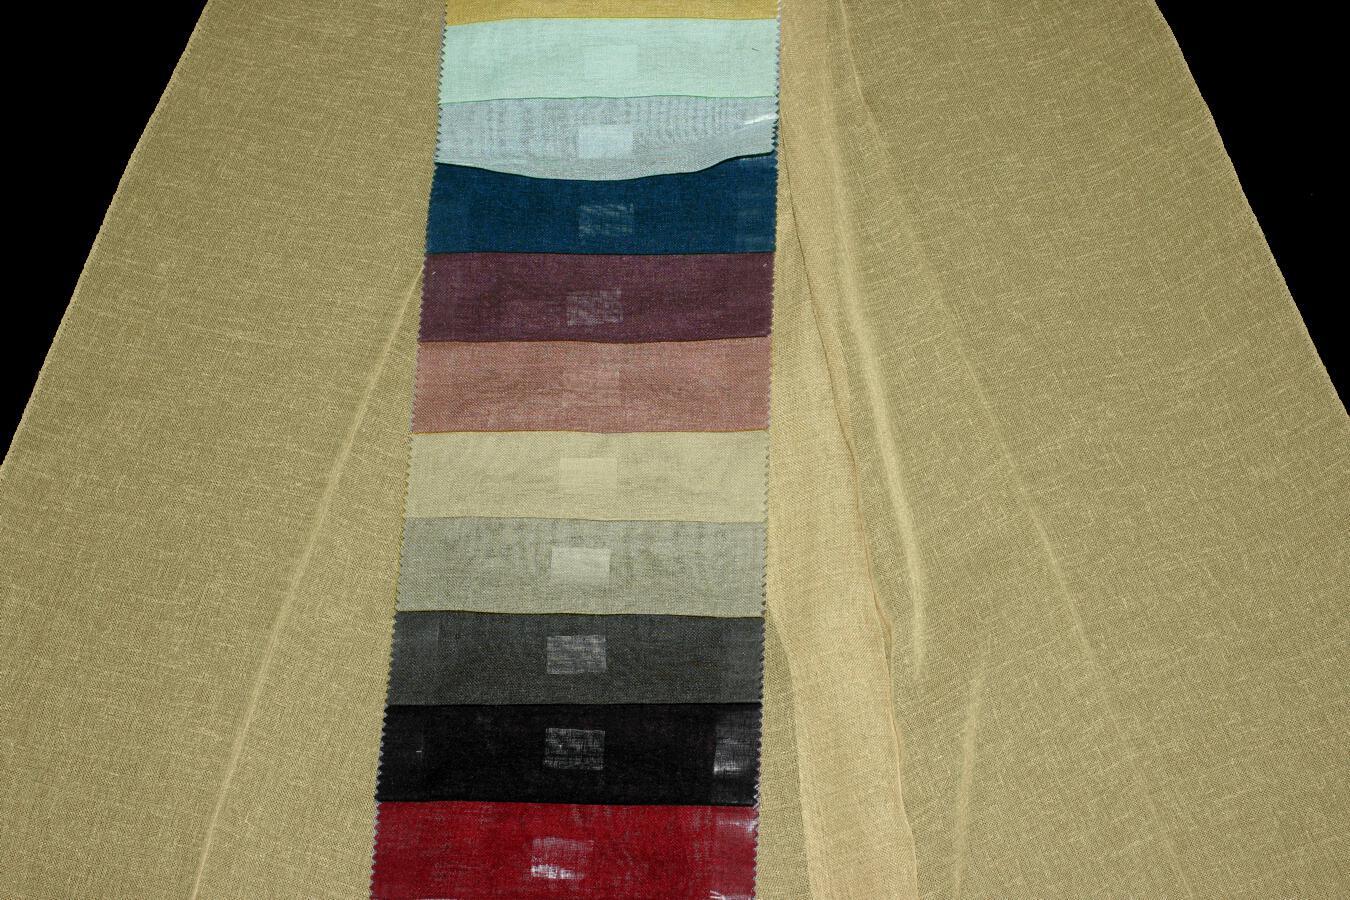 Záclona Freedy Šíře: 290 cm 50 šedobílá